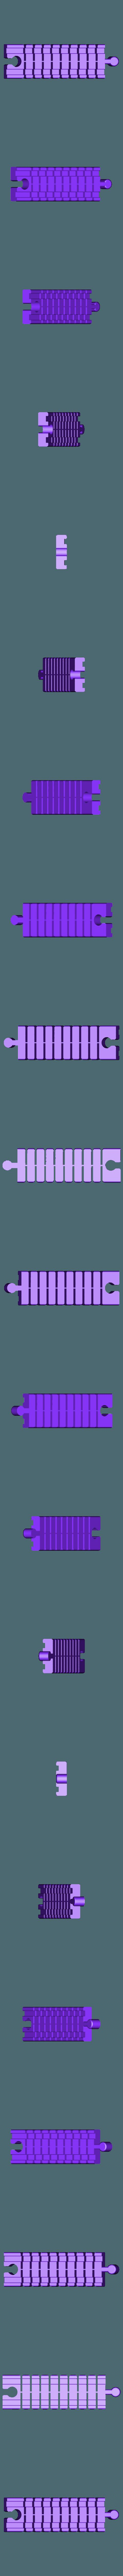 Flex Track.stl Download free STL file Toy Train Tracks • 3D printer design, FerryTeacher